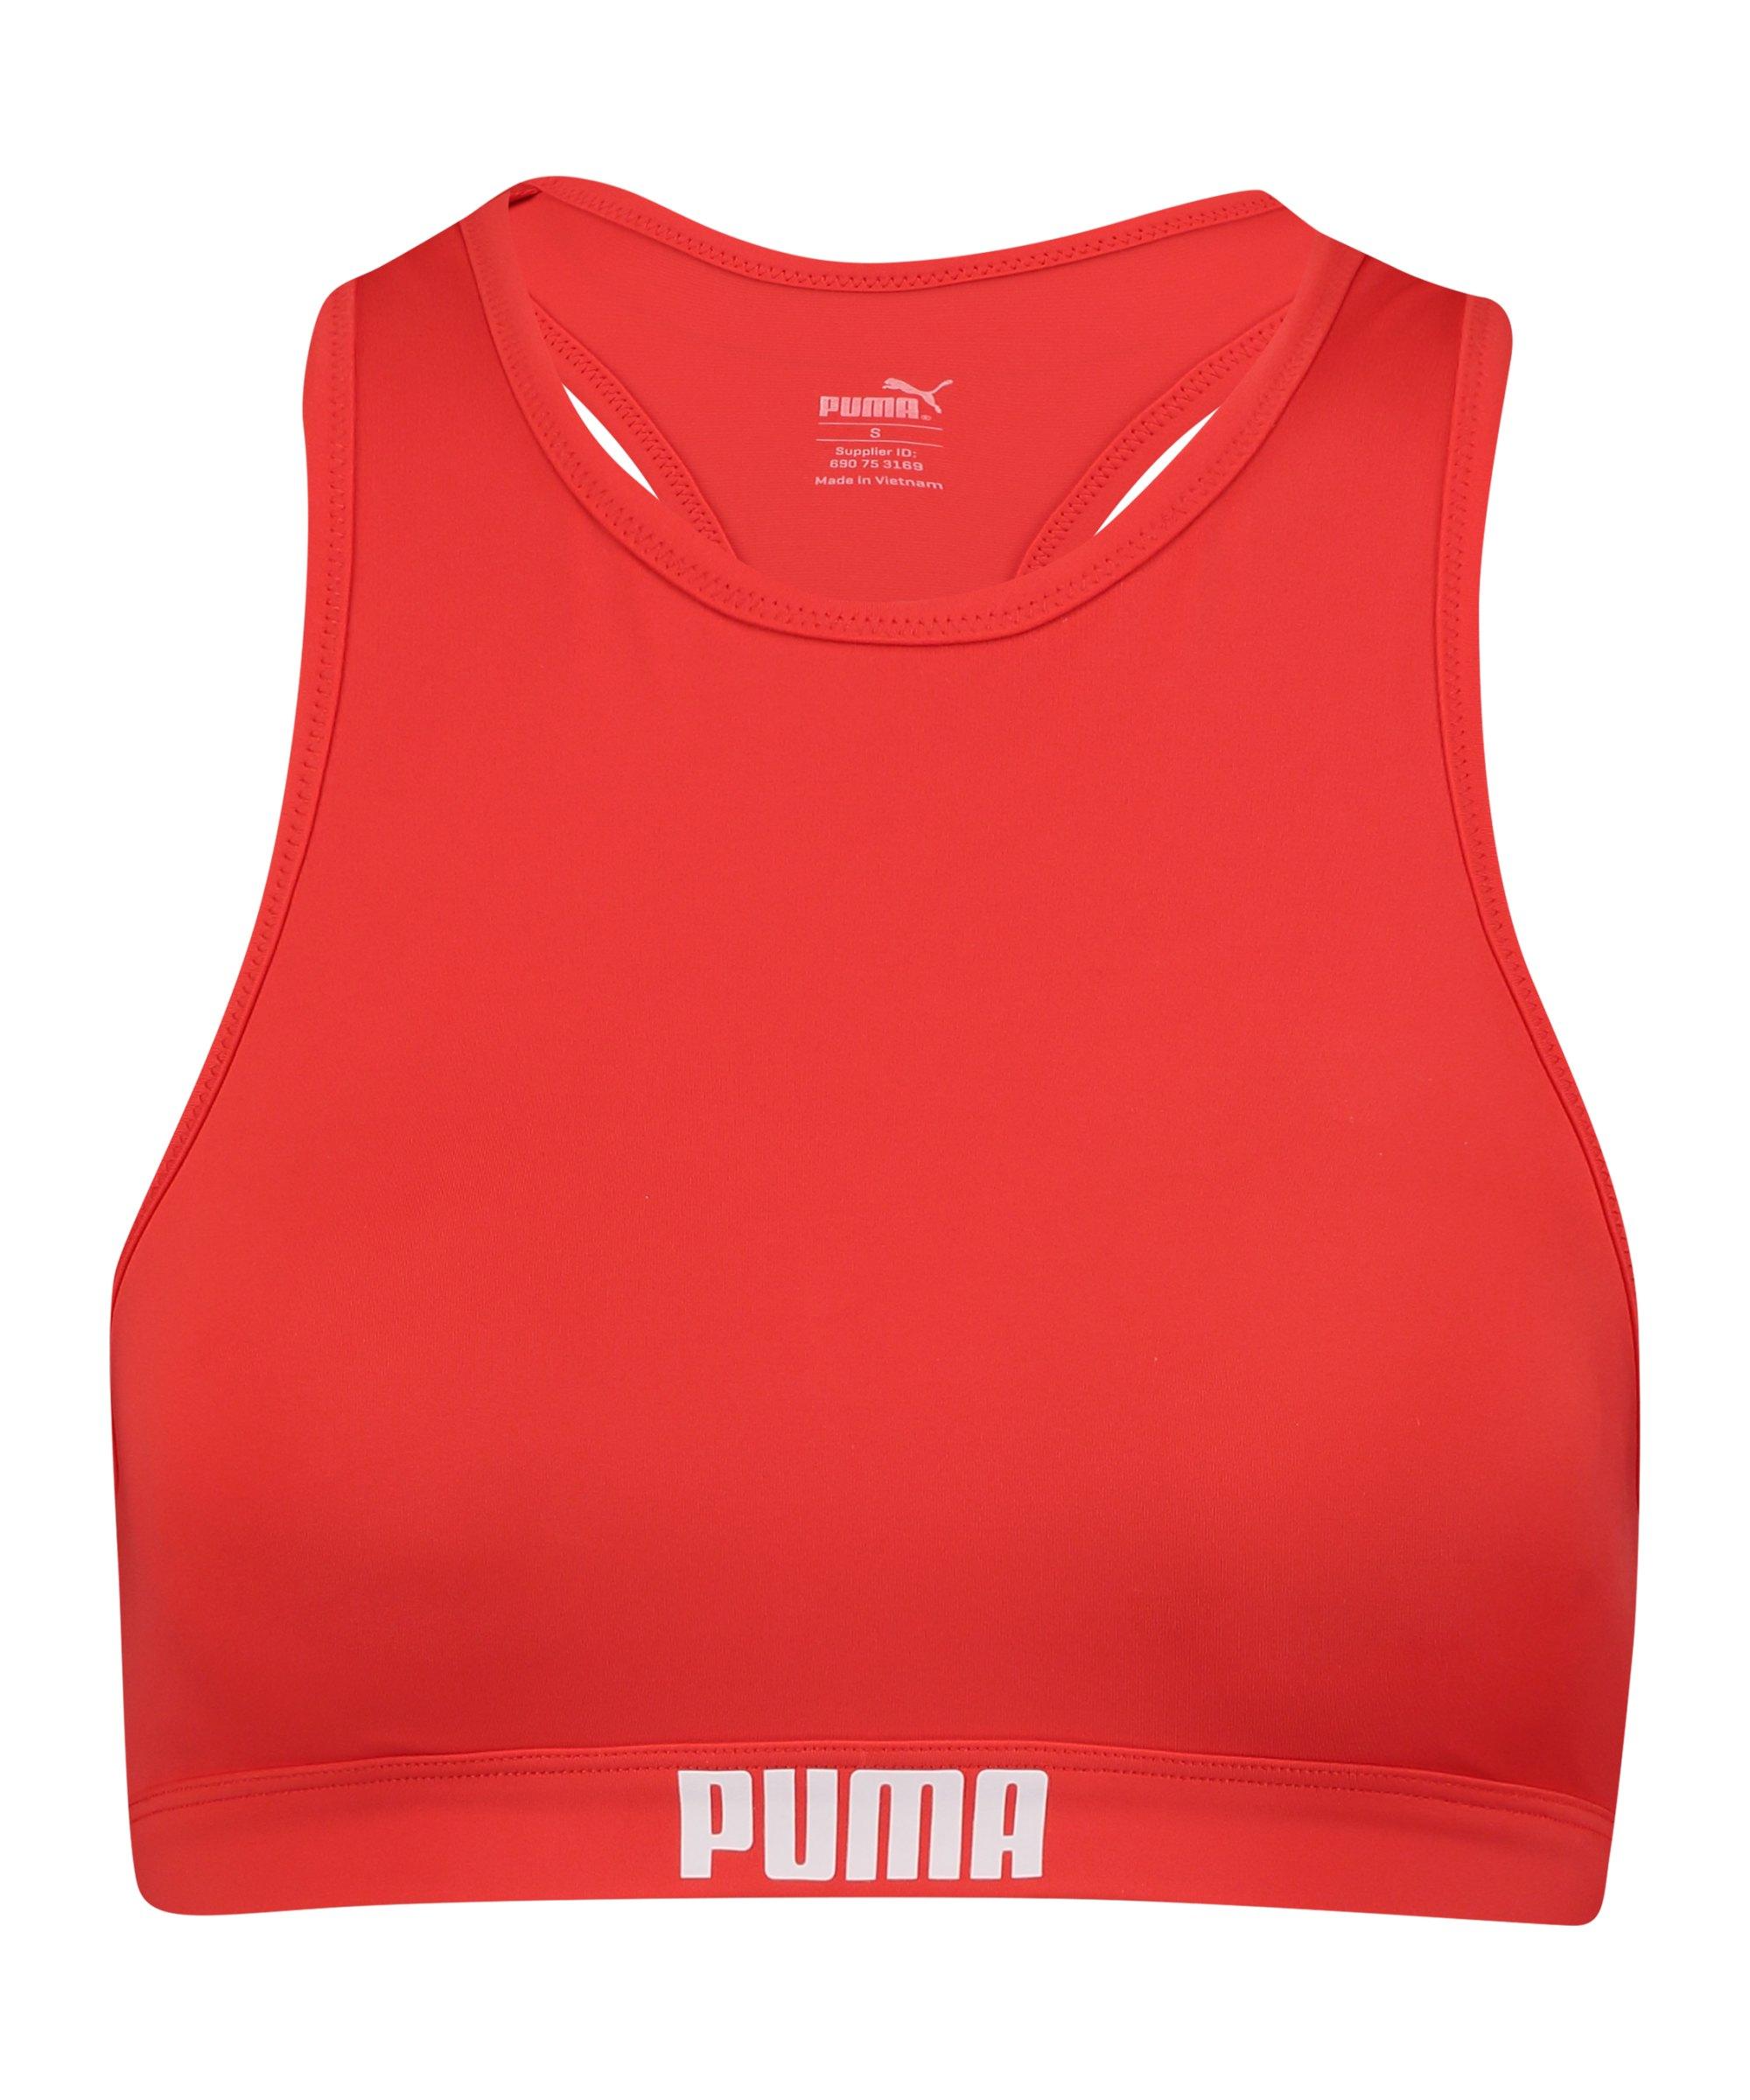 PUMA Racerback Bikini Top Damen Rot F002 - rot